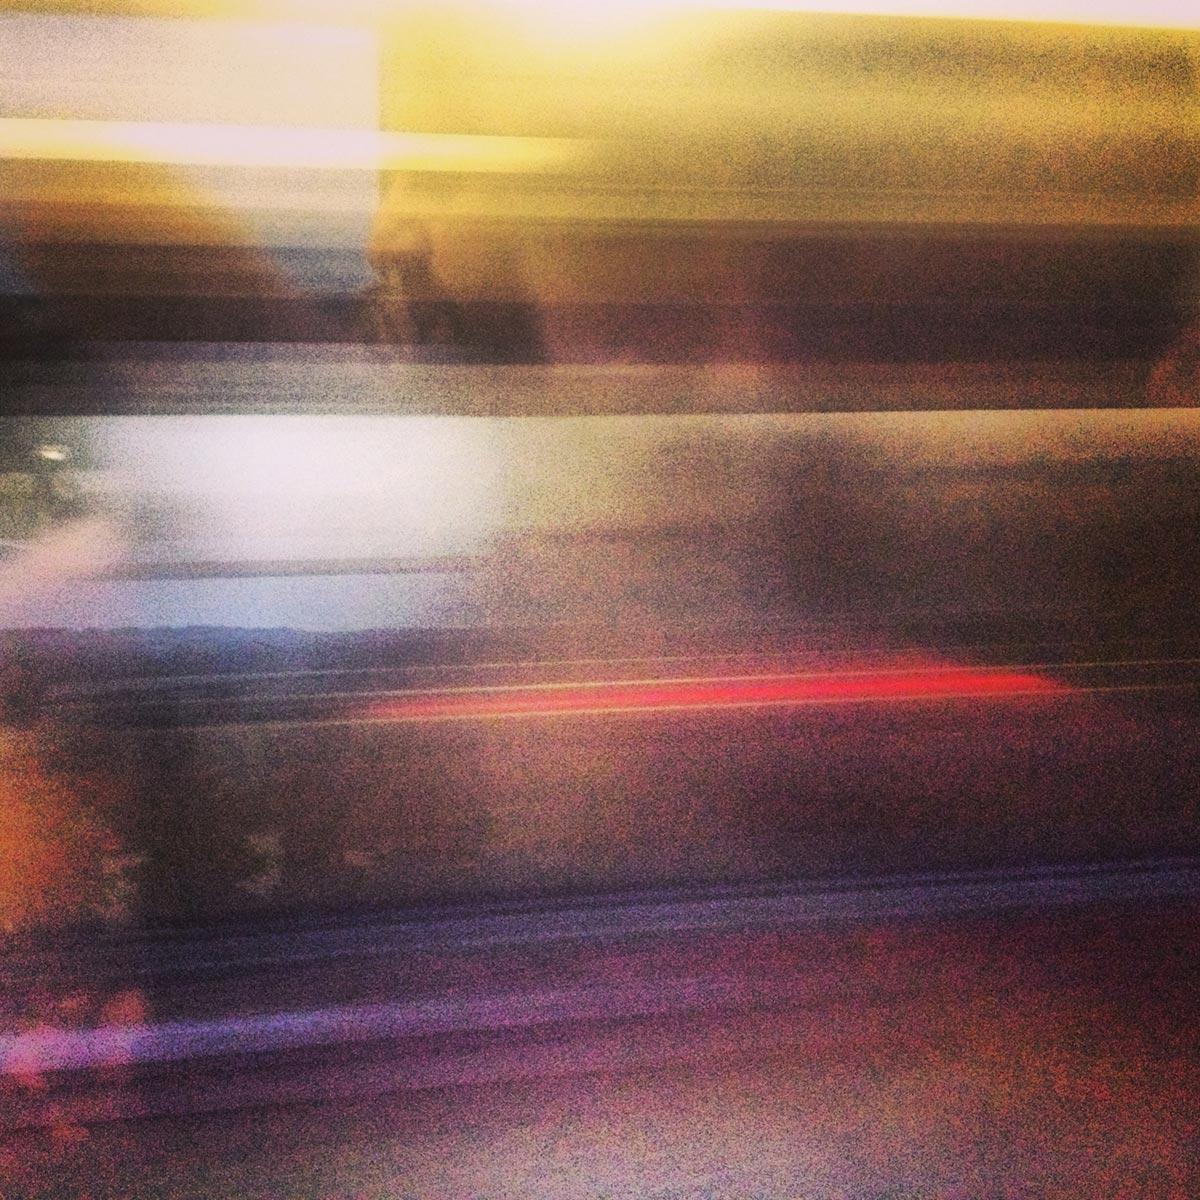 Ambient train journey